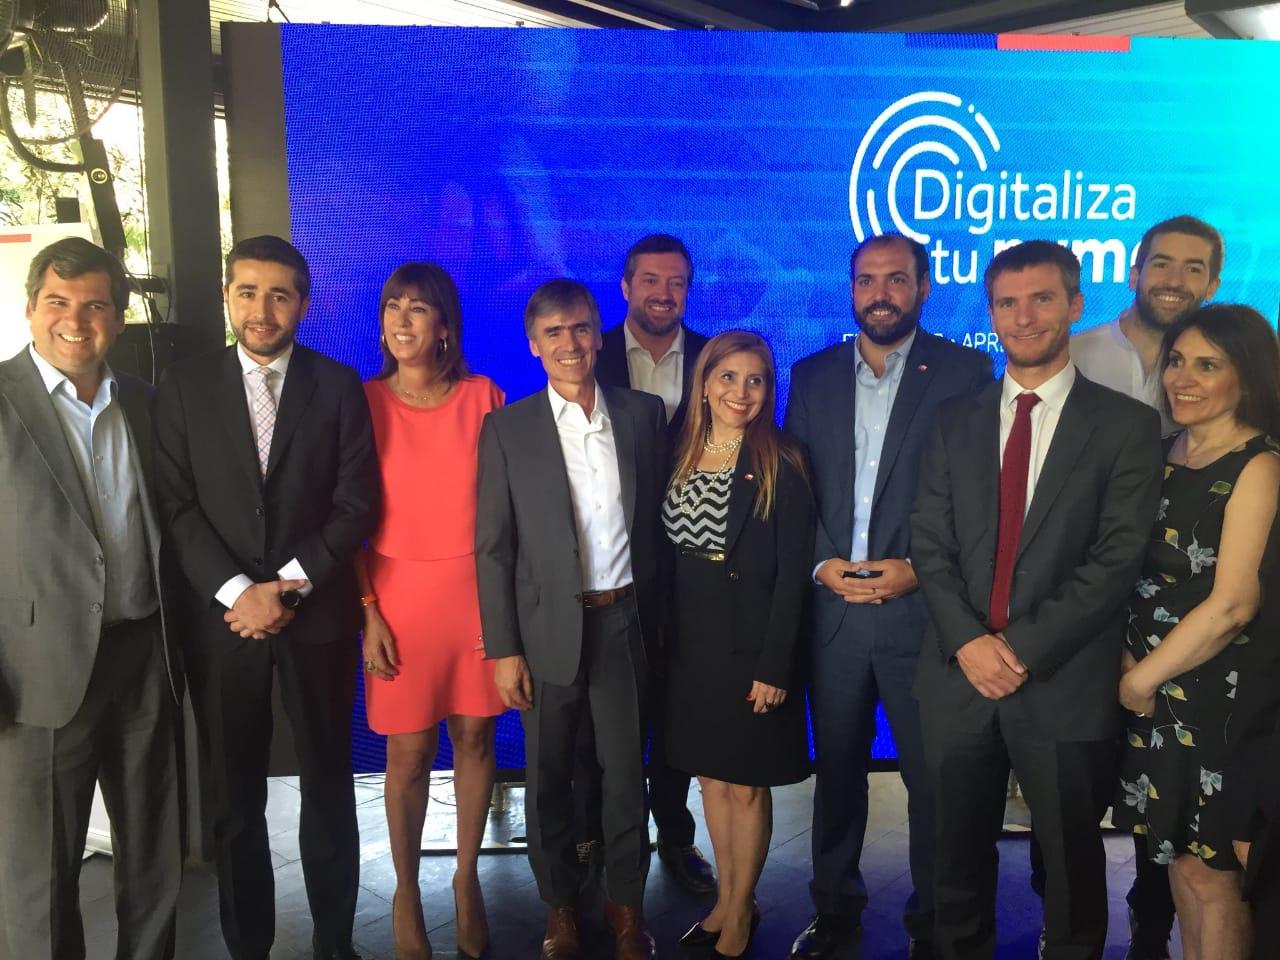 País Digital colabora con programa público-privado «Digitaliza tu Pyme»